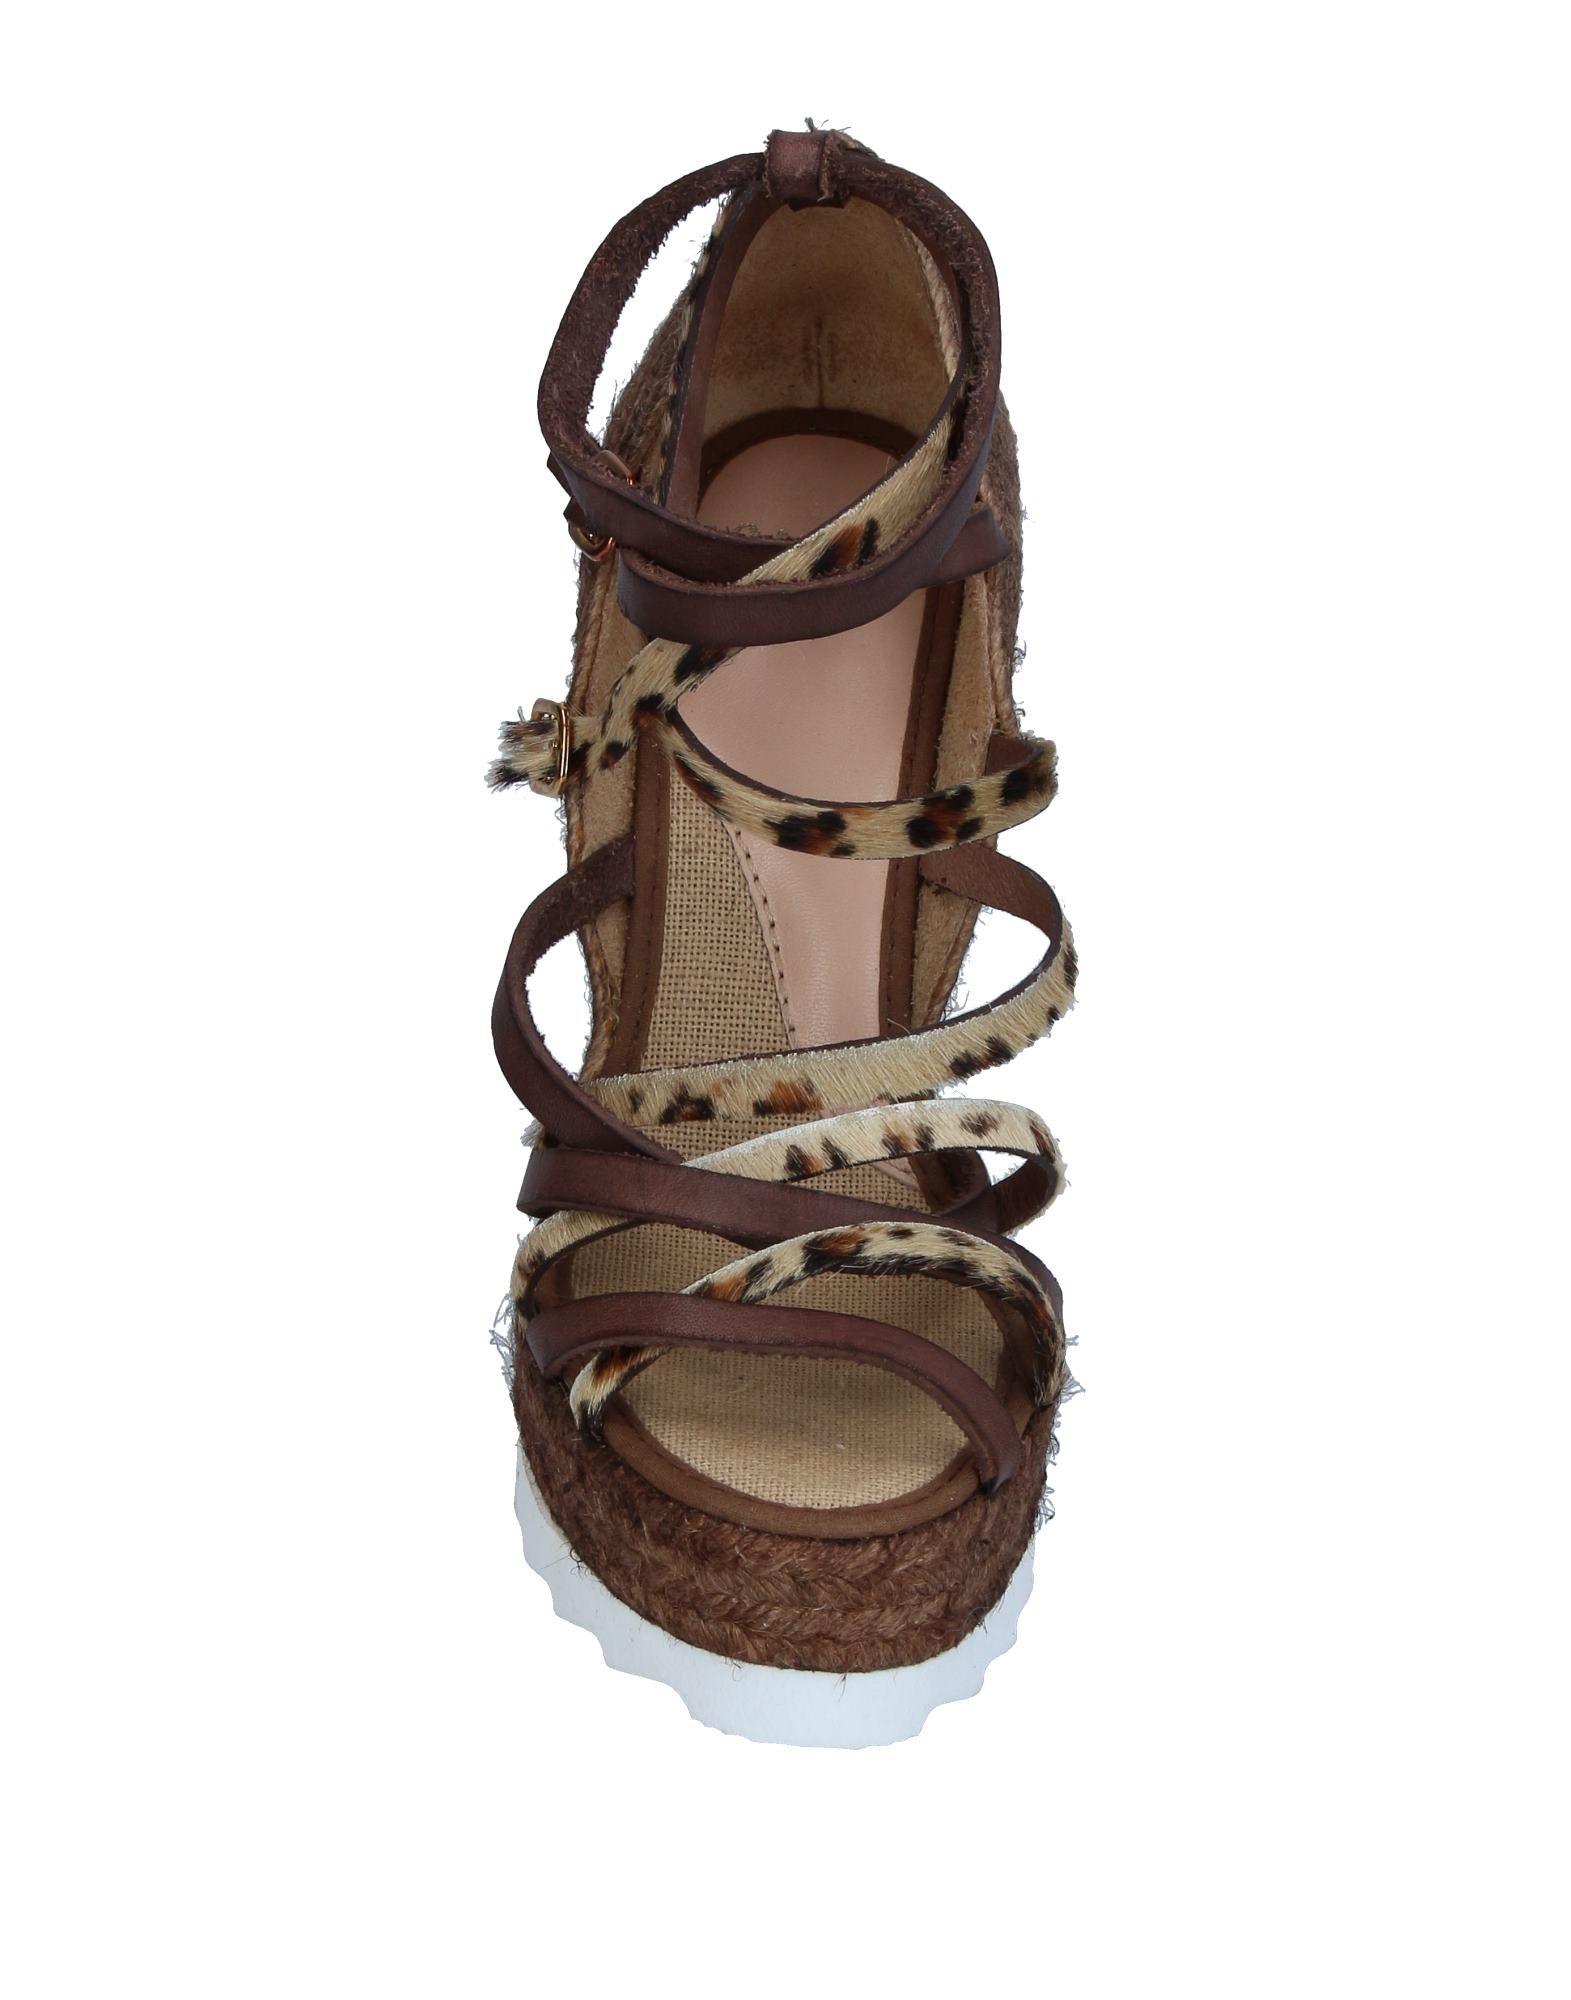 Sandales Ovye By Cristina Lucchi Femme - Sandales Ovye By Cristina Lucchi sur